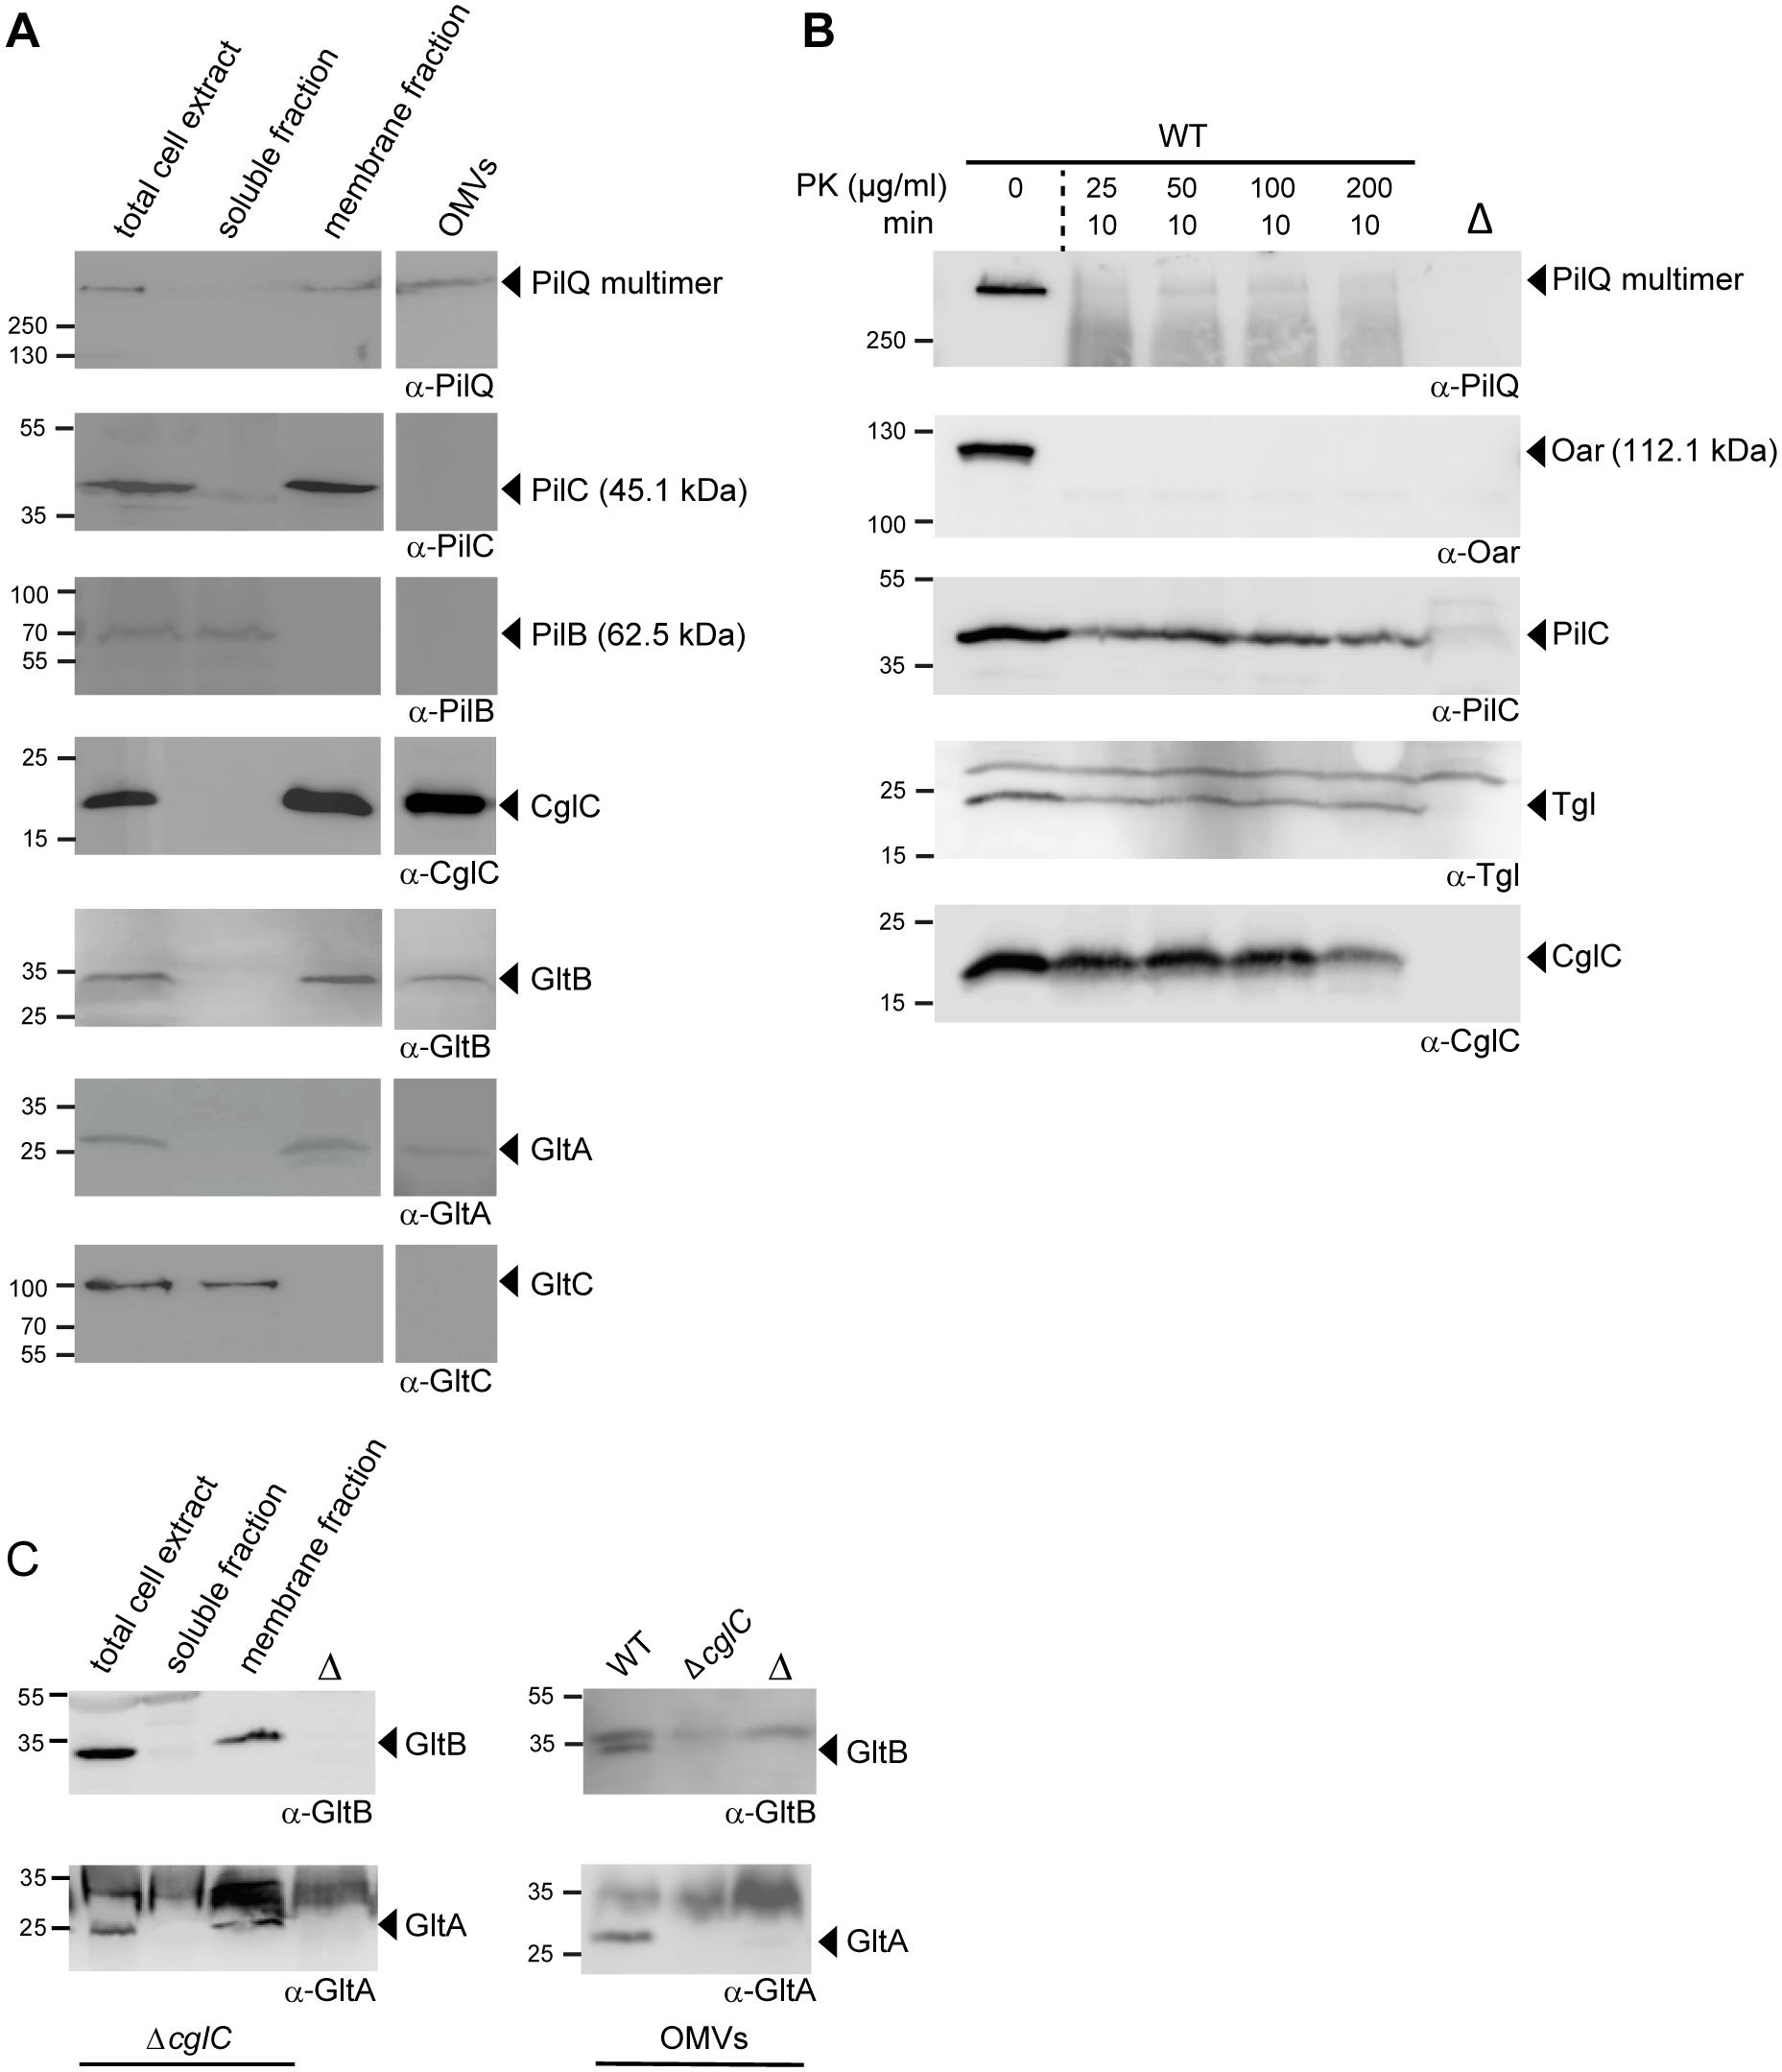 Subcellular localization of CglC, GltB, GltA and GltC.